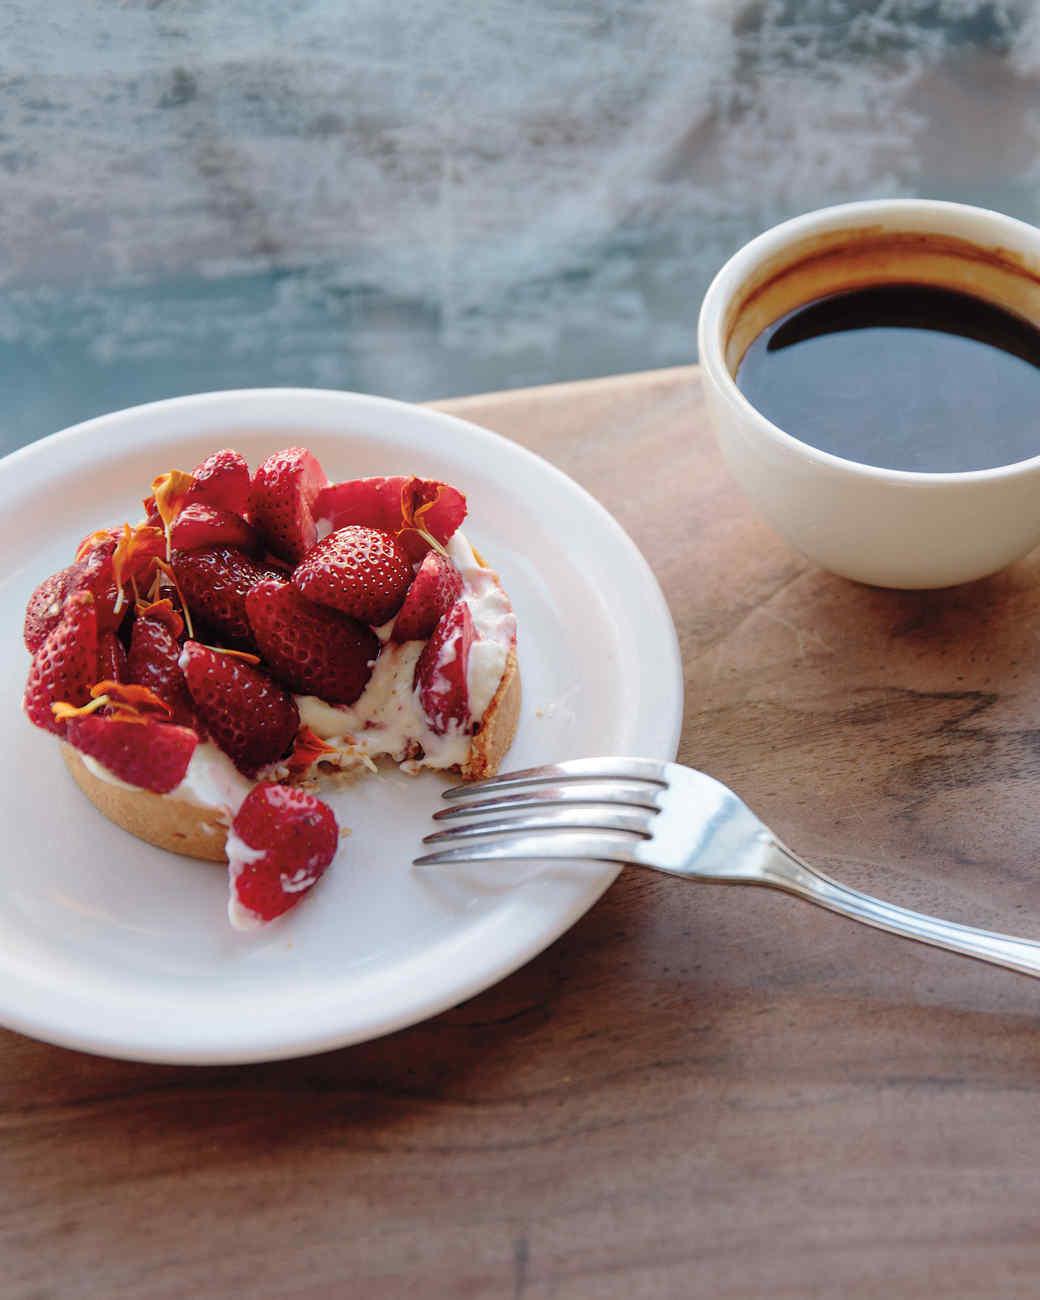 tartine-bakery-cafe-san-francisco-u4a0861-md110122.jpg